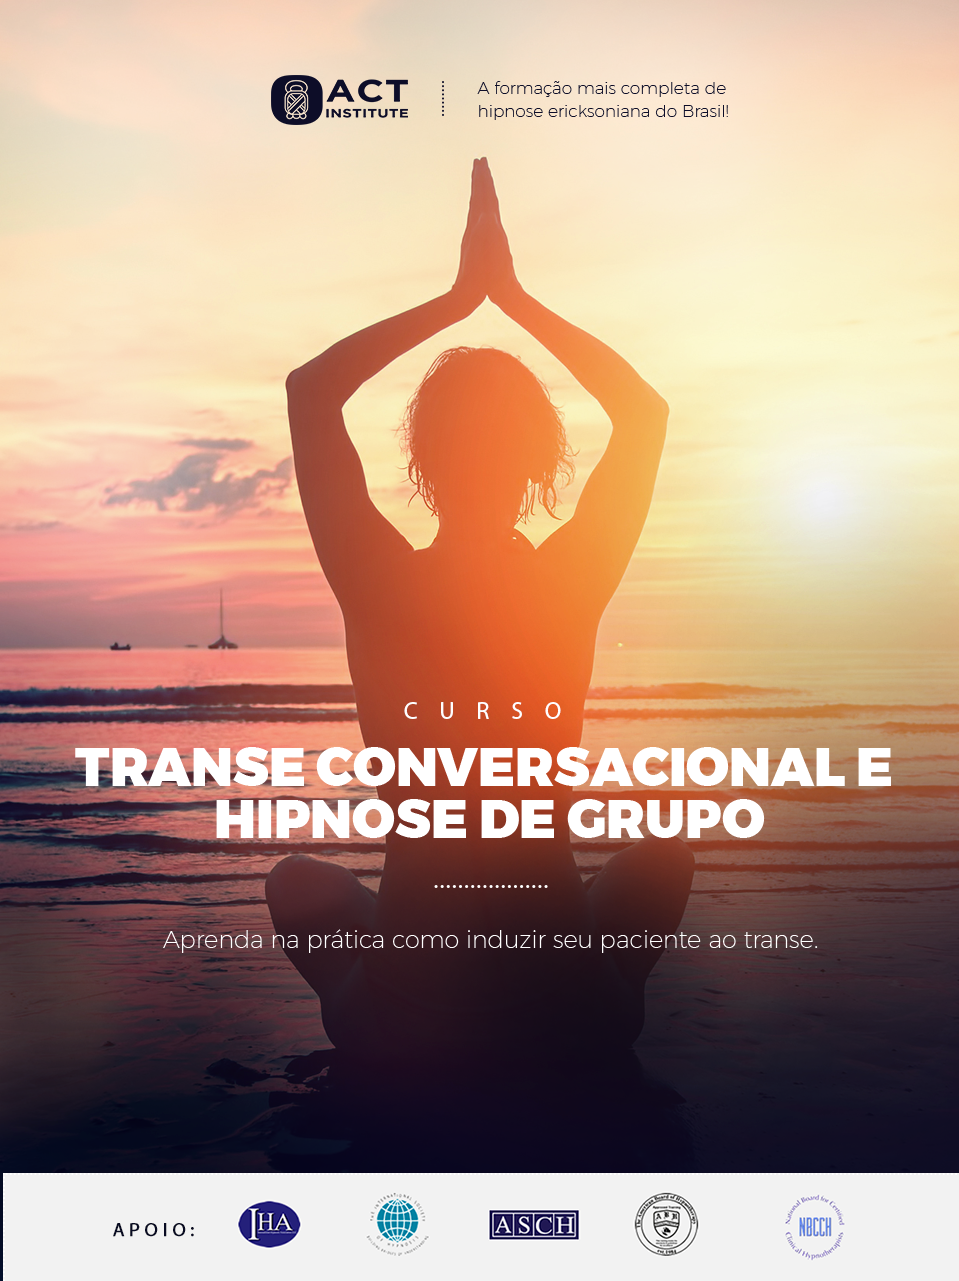 Módulo Avançado de Hipnose Ericksoniana   Transe Conversacional   ACT Institute